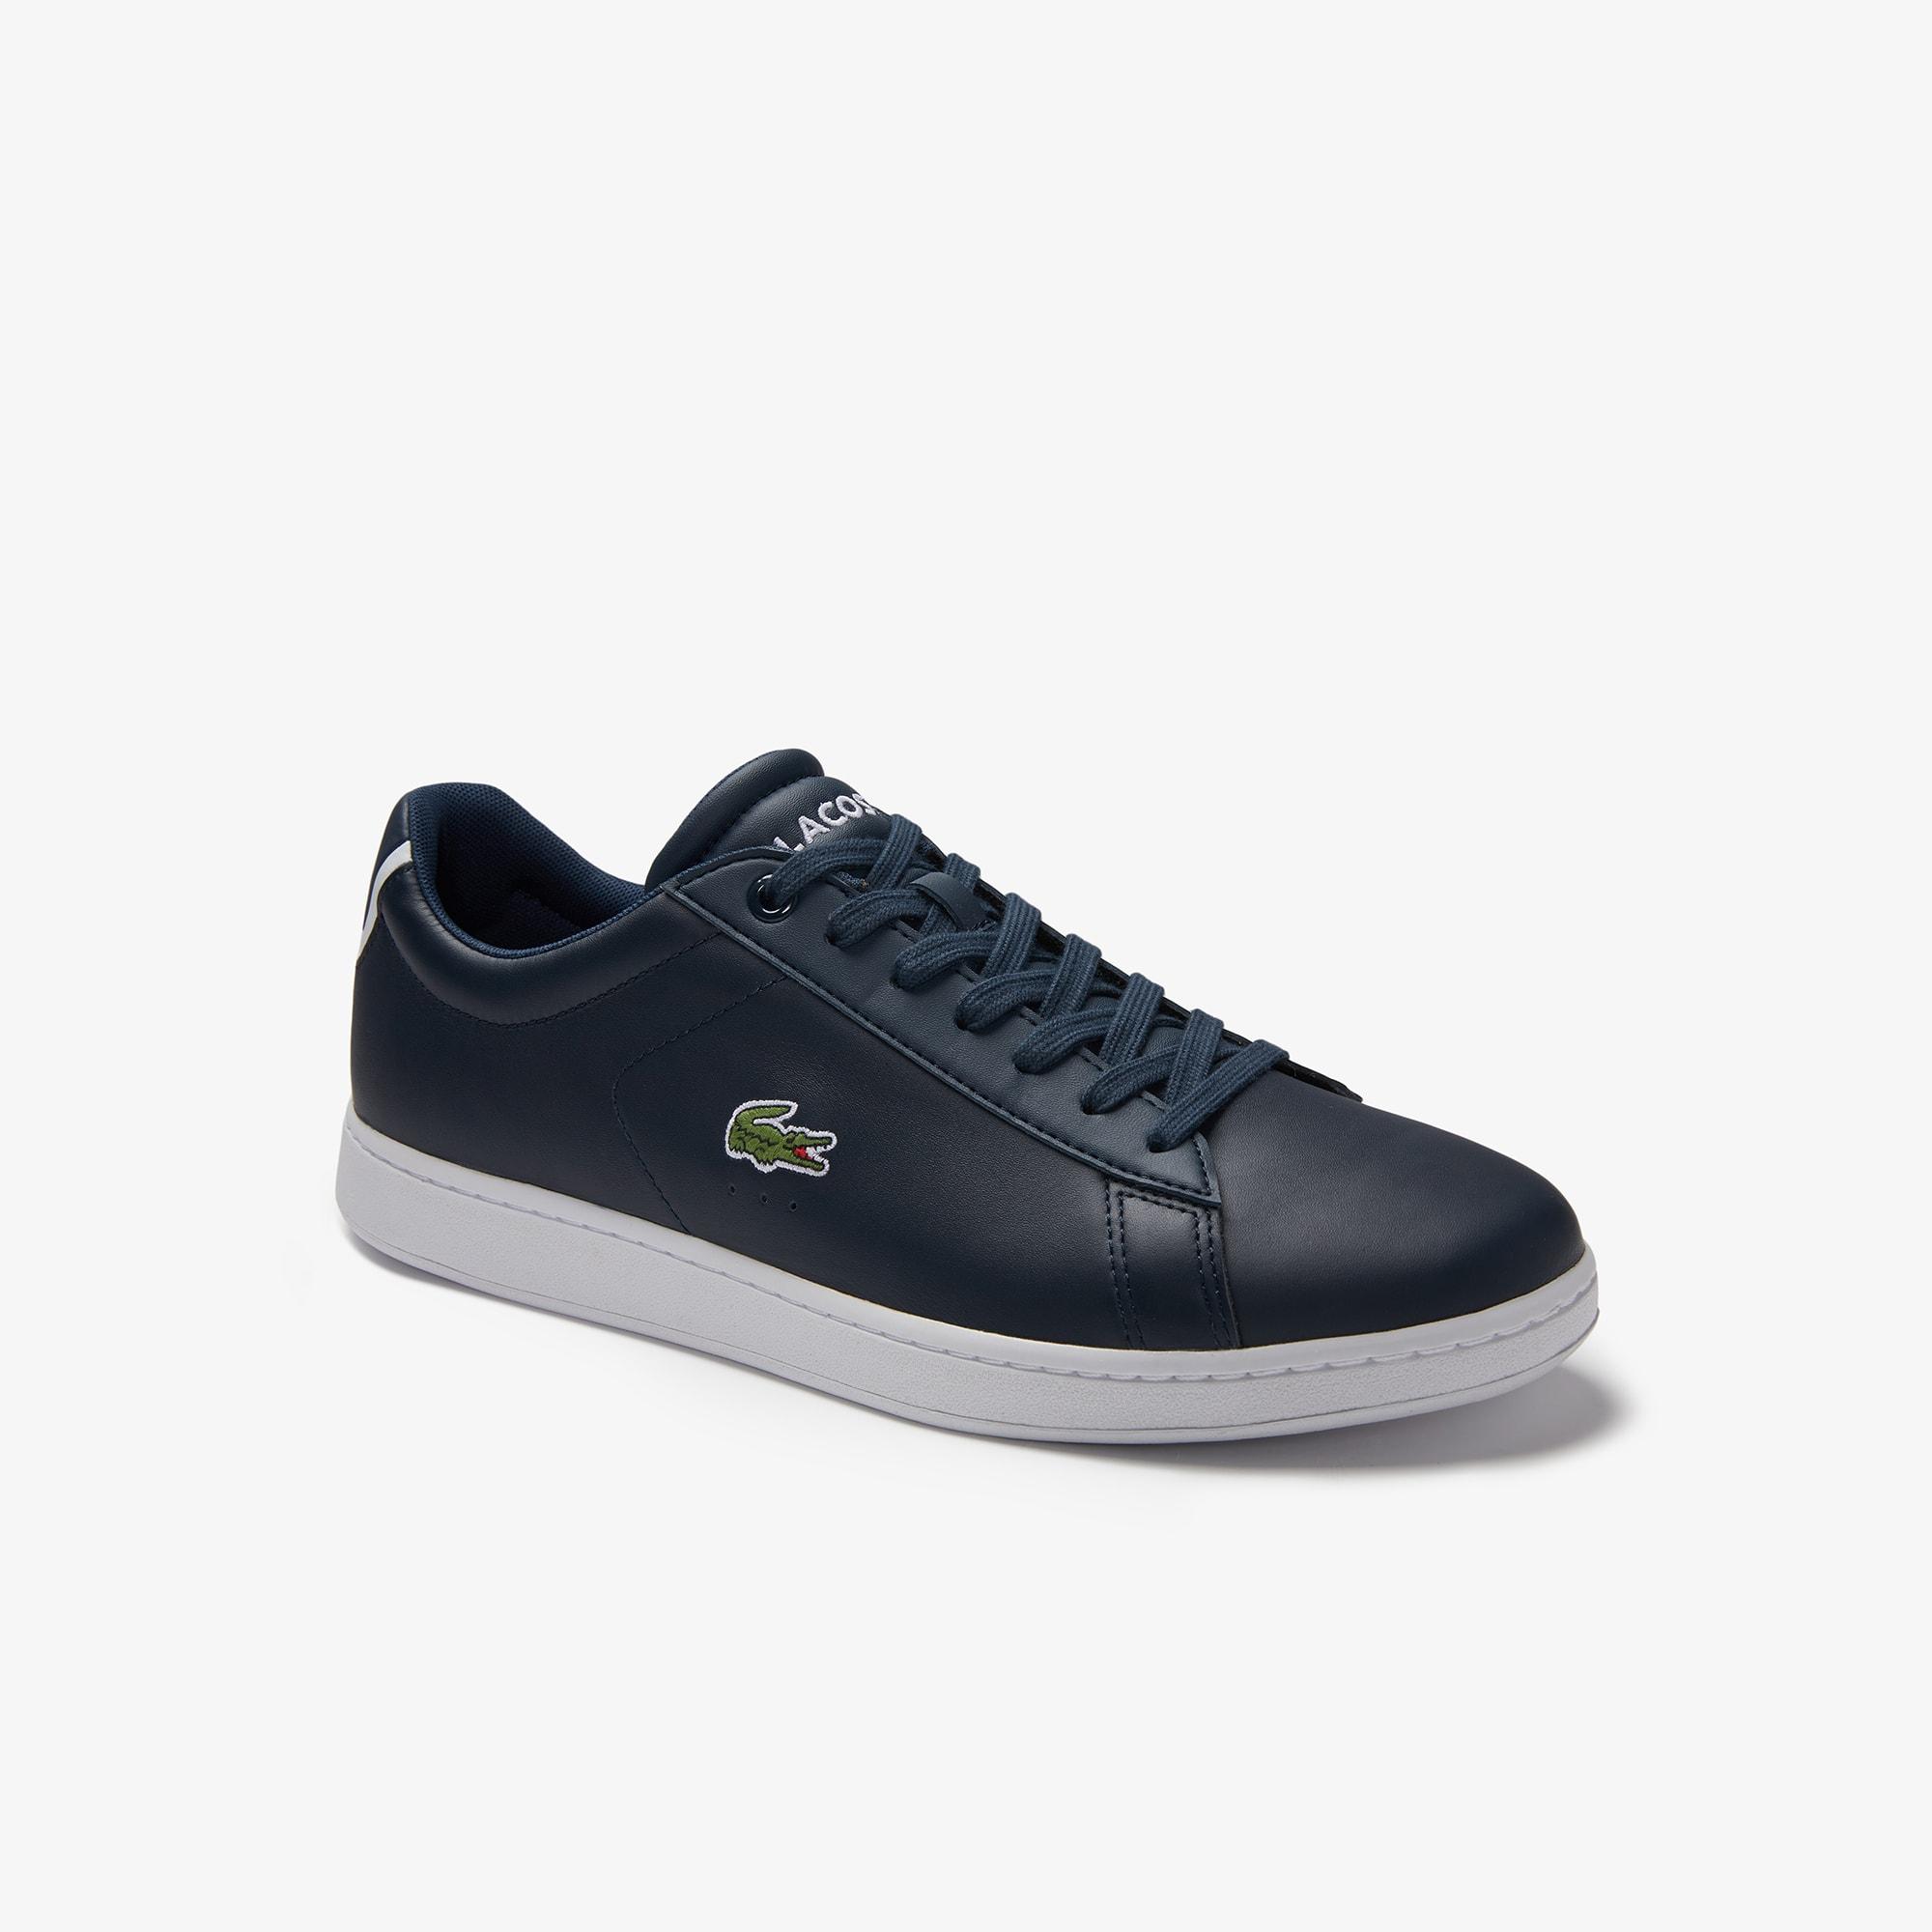 Herren-Sneakers CARNABY EVO aus Leder mit Kontrast-Akzenten